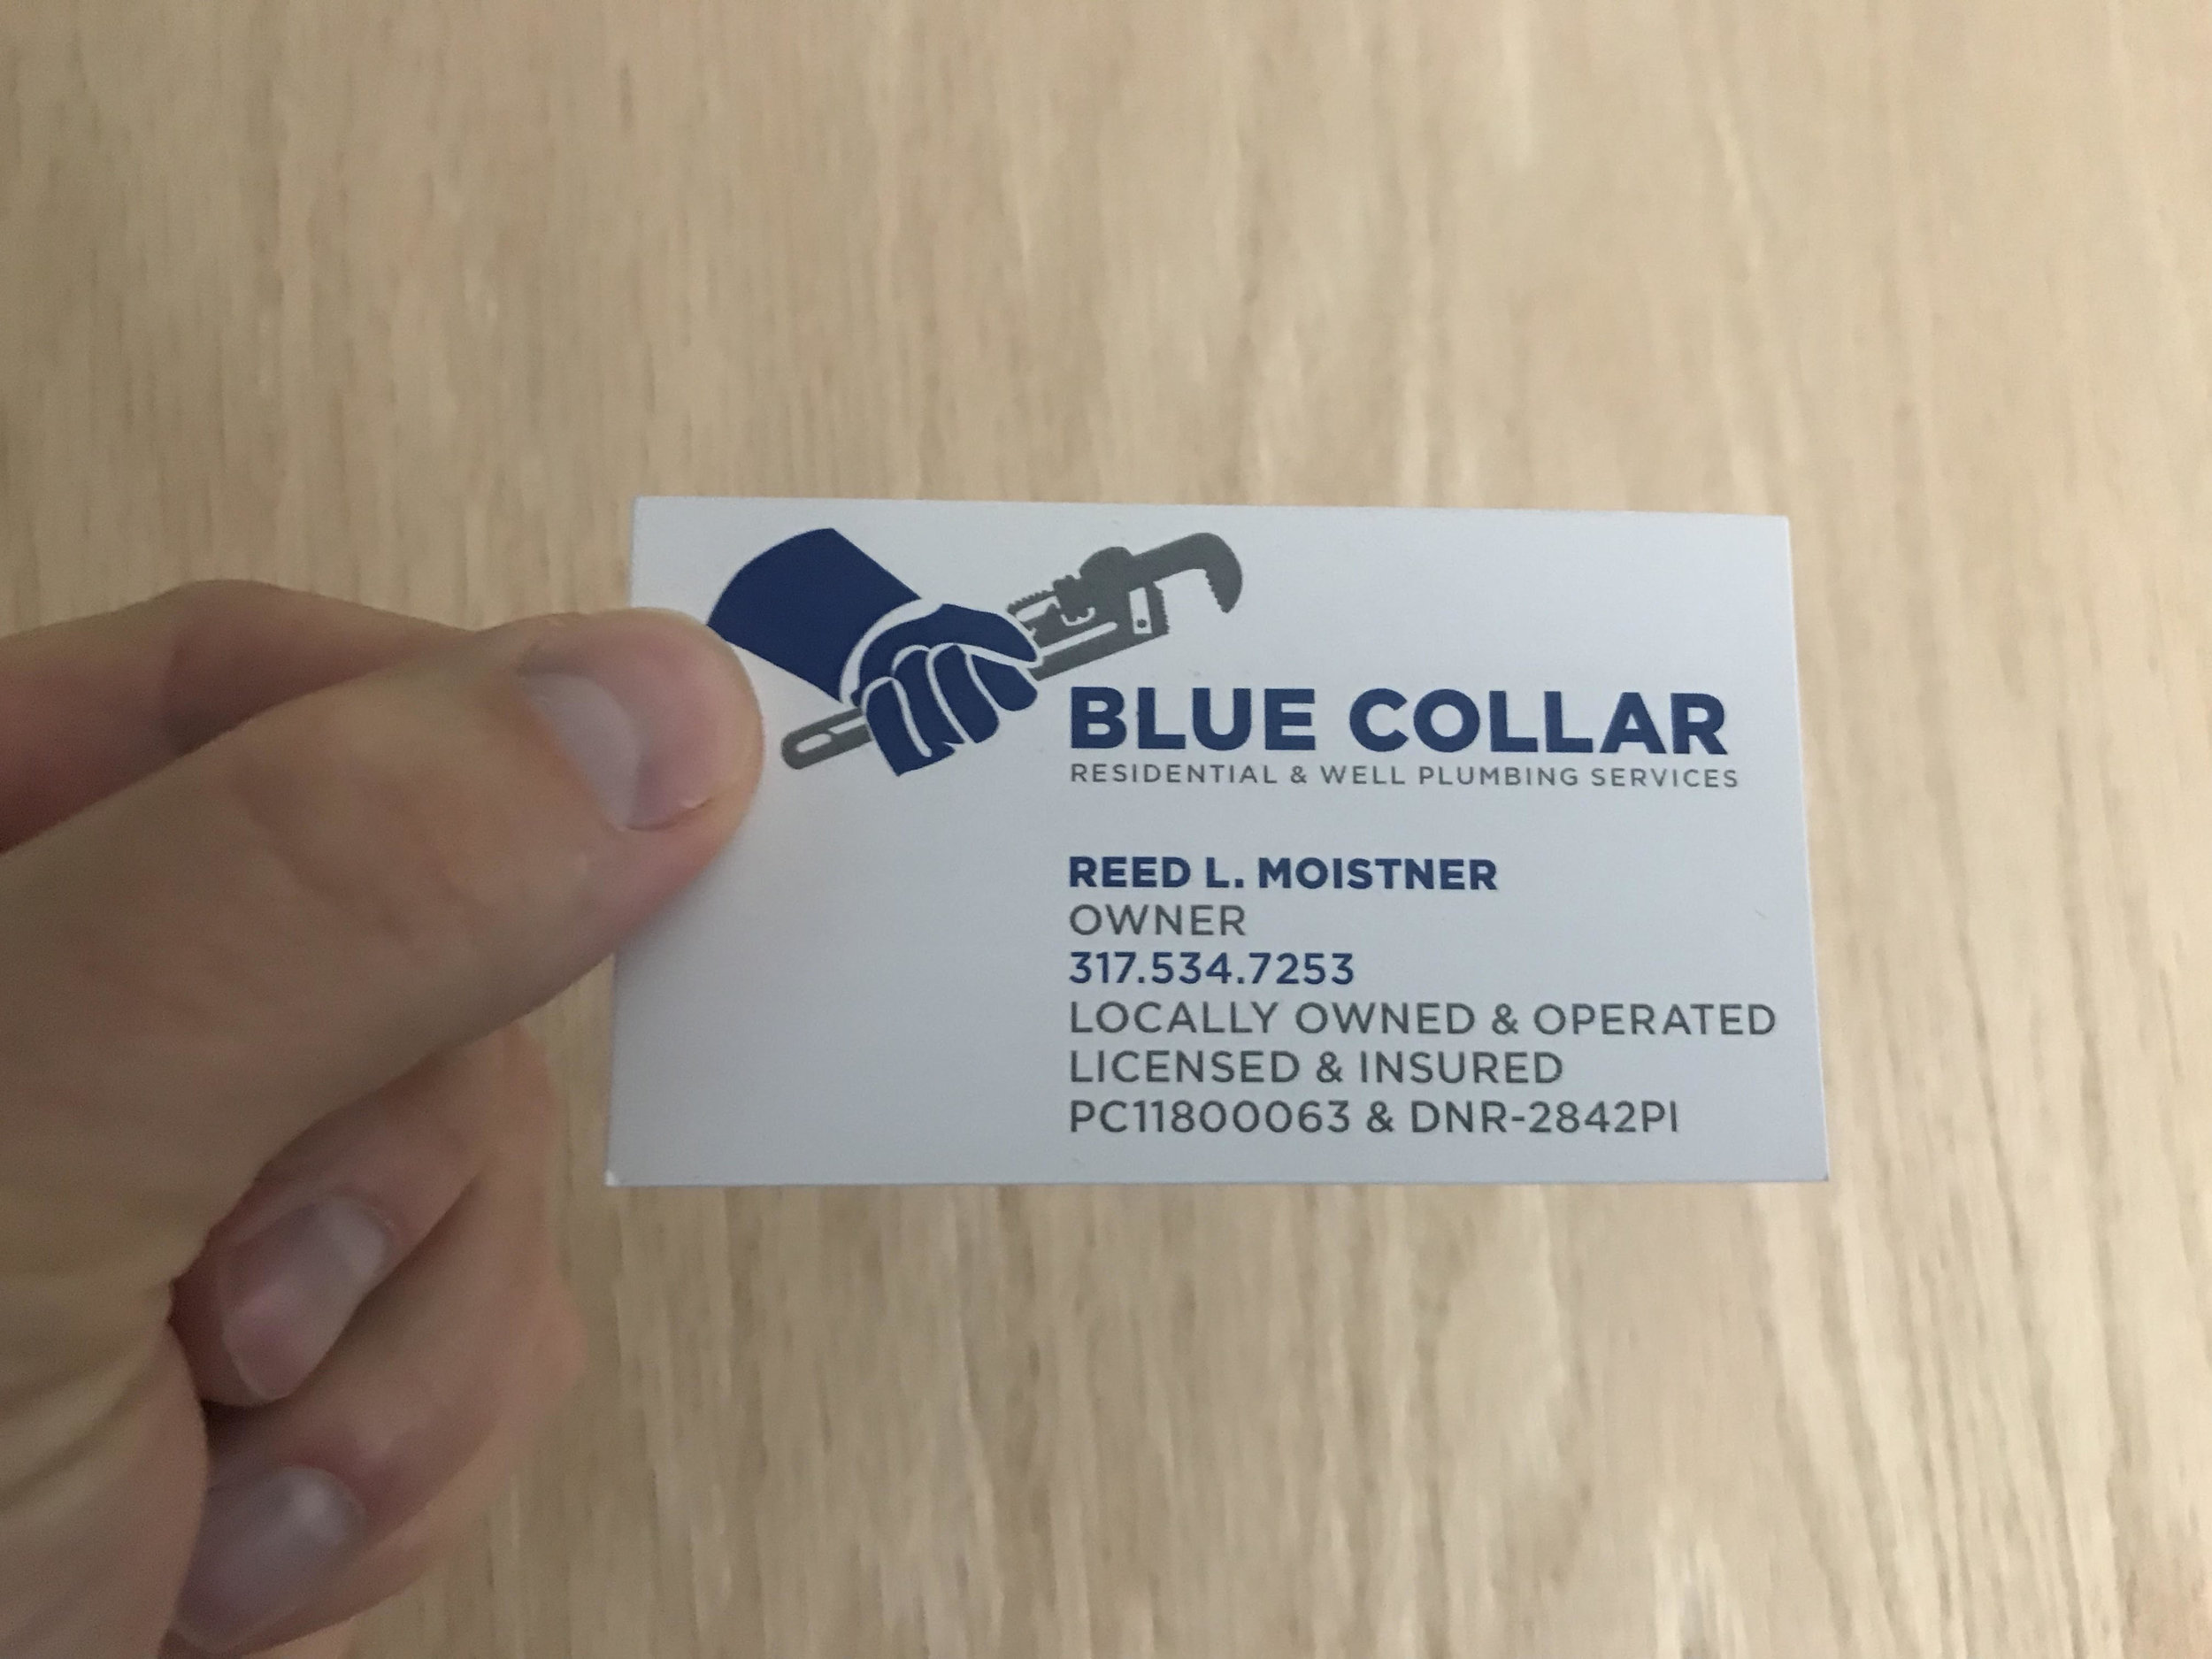 Blue Collar Plumbing Business Card Front